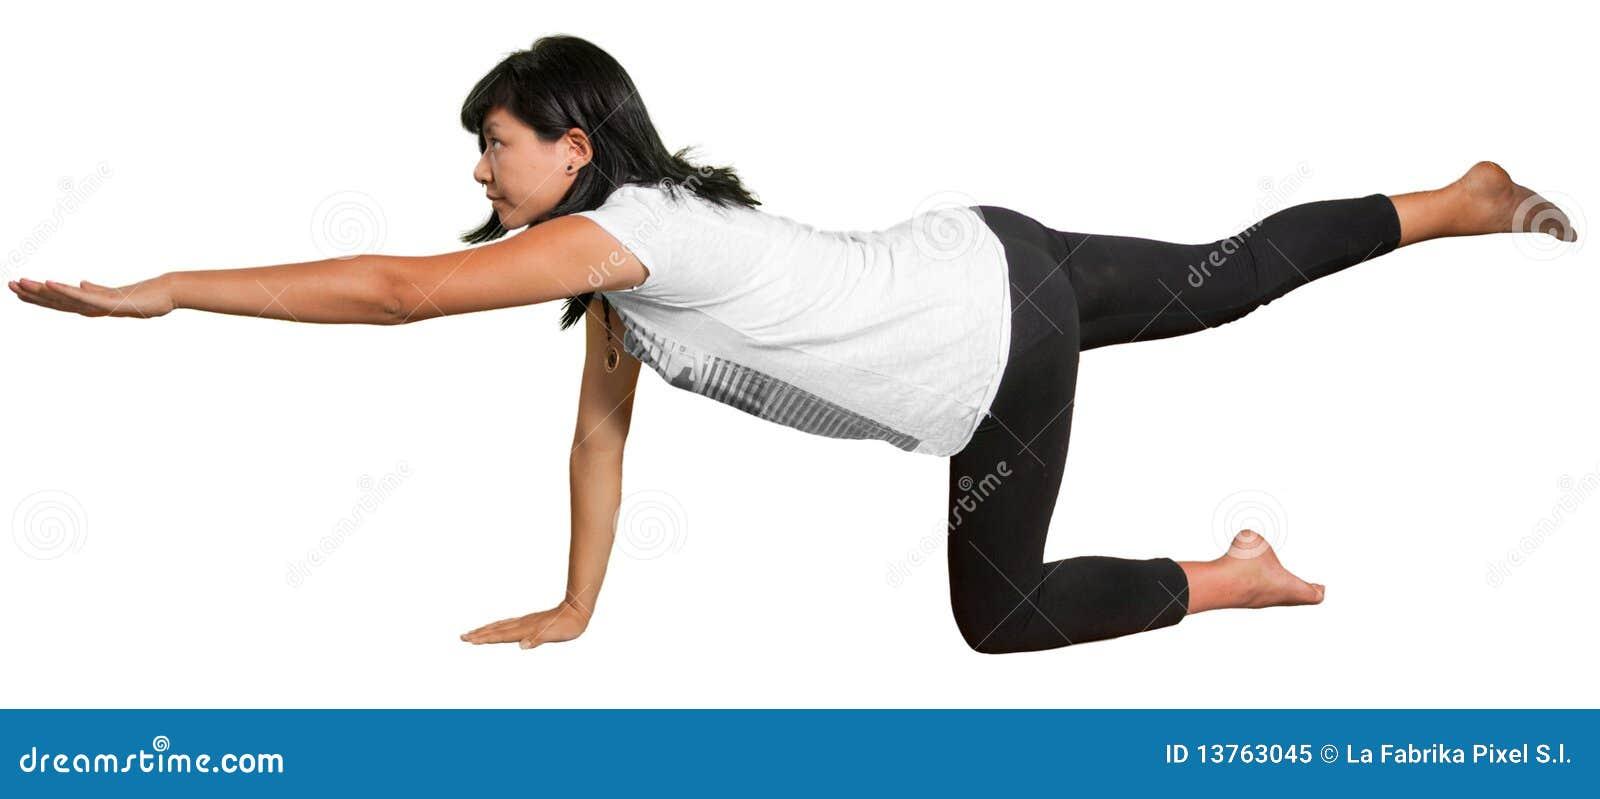 Pregnant woman in Yoga pose